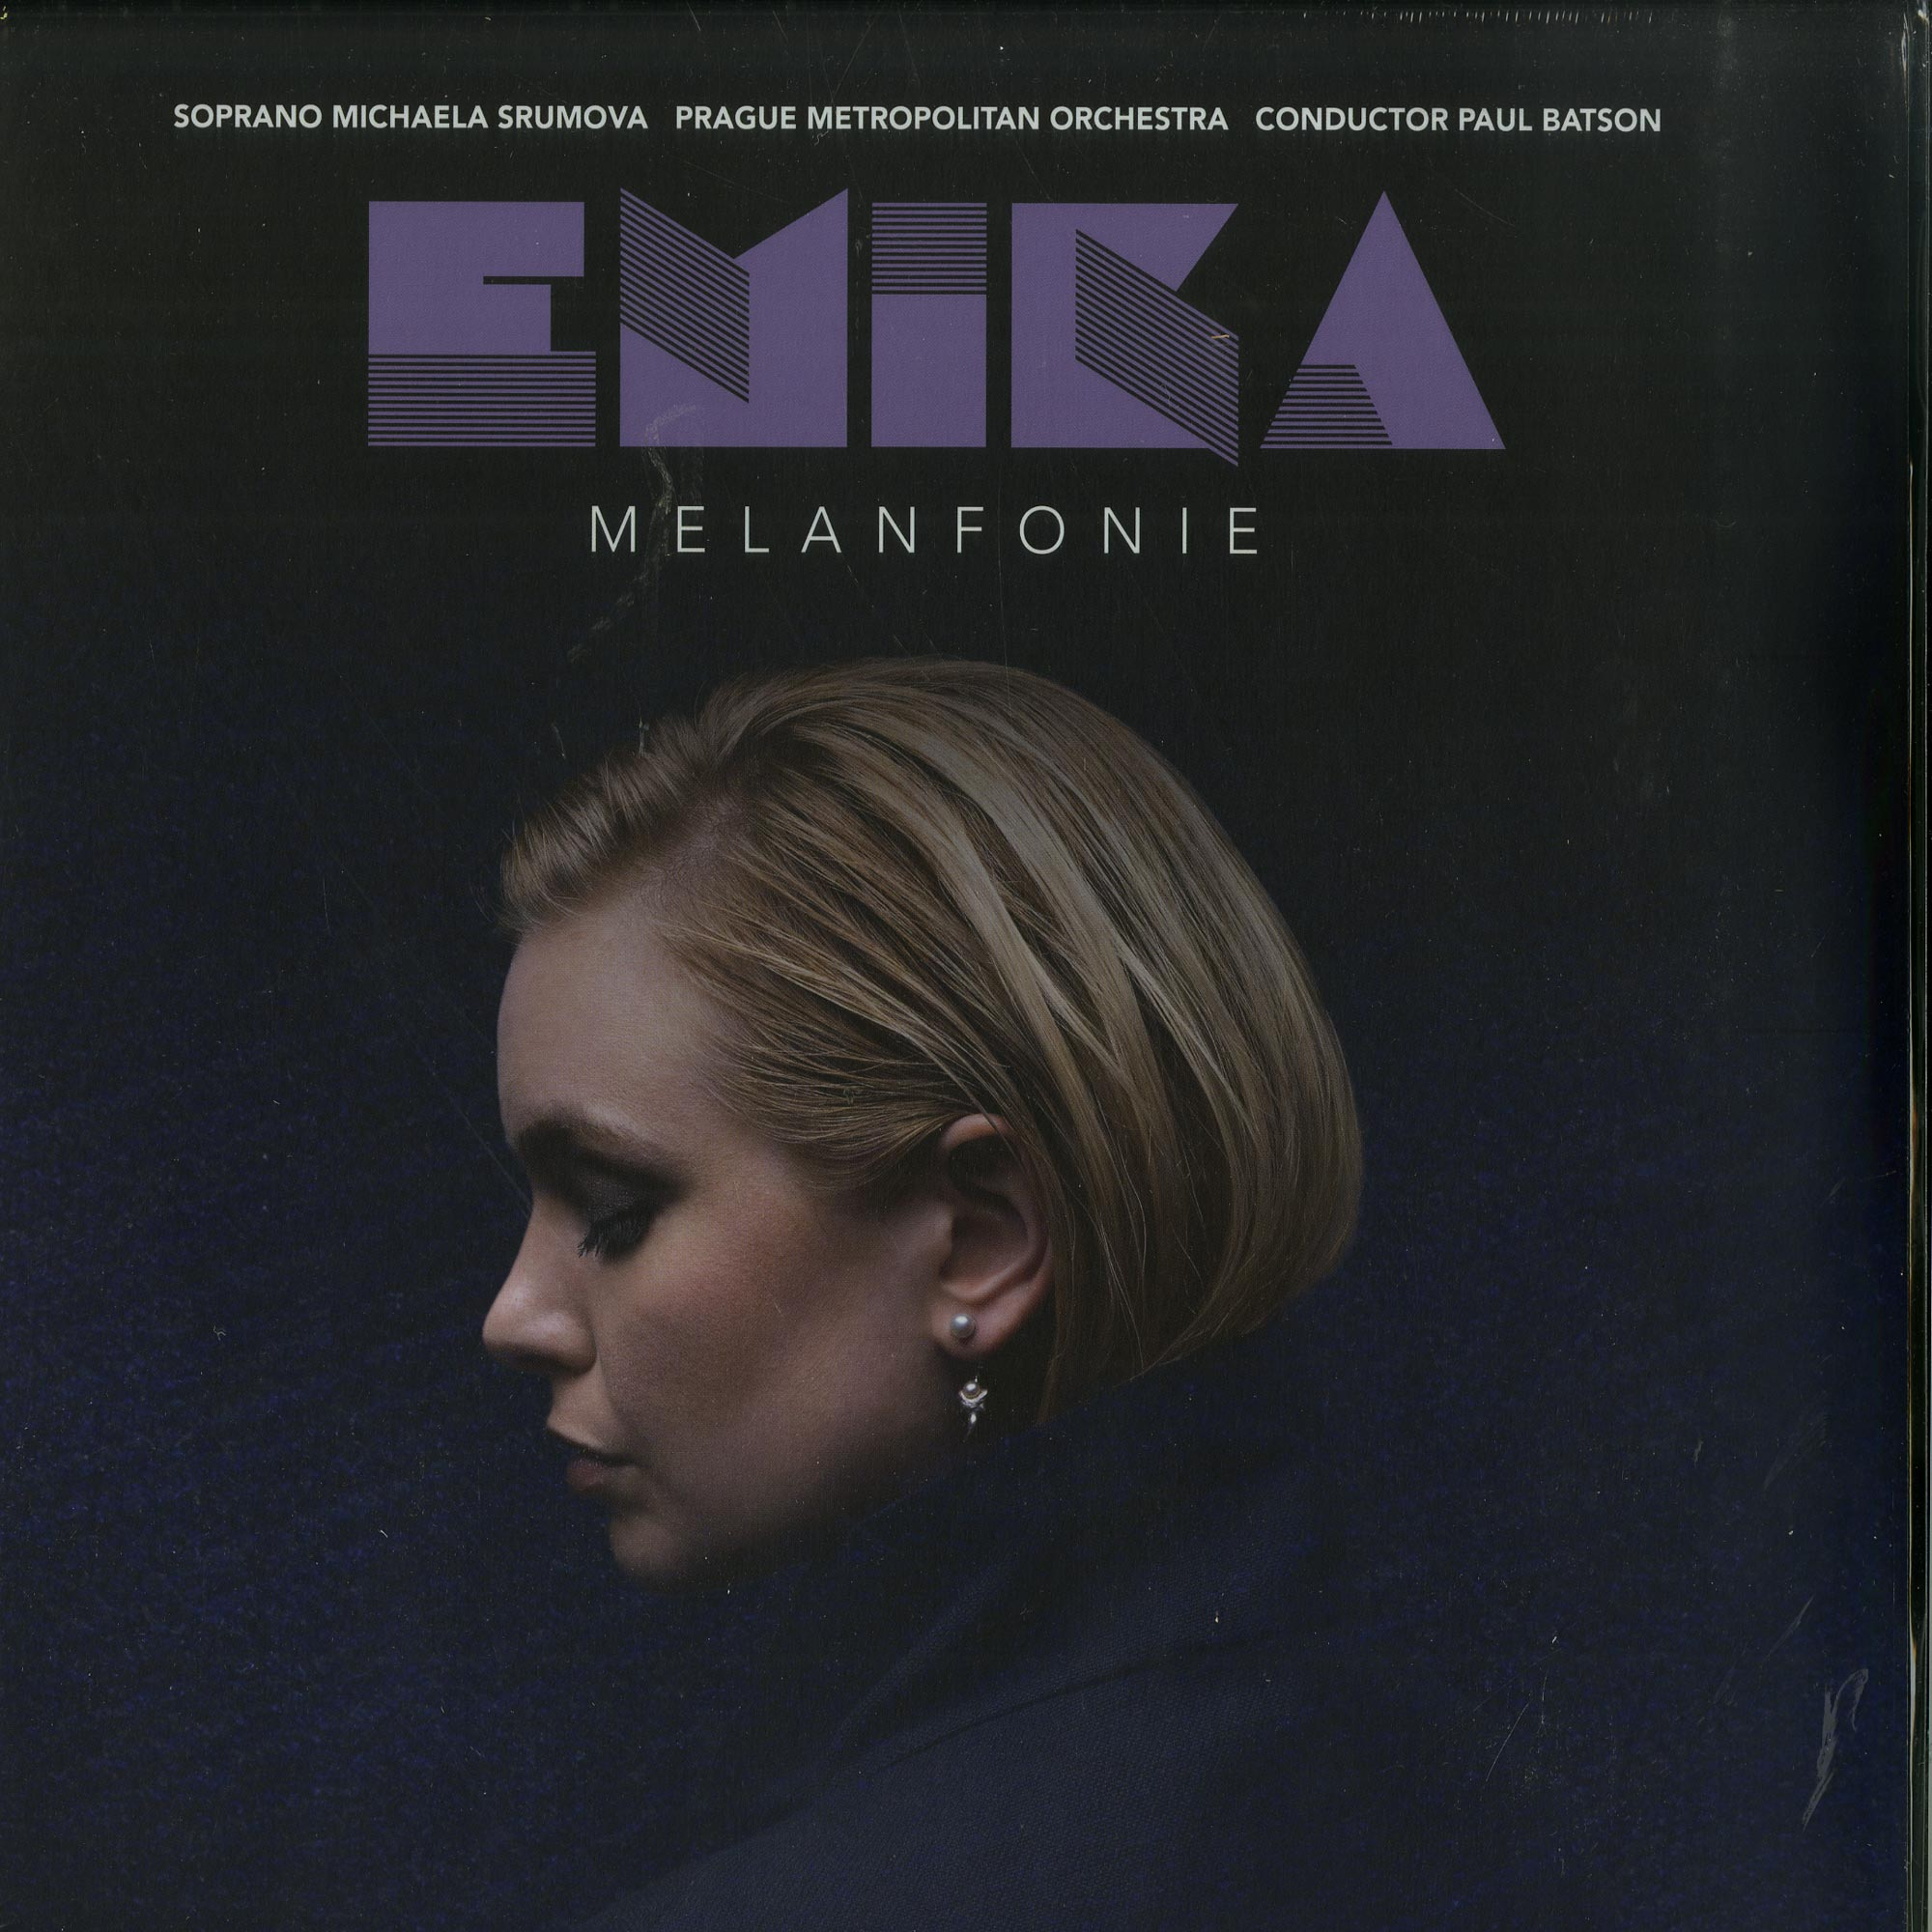 Emika ft. Michaela Srumova and the Prague Metropolitan Orchestra - MELANFONIE